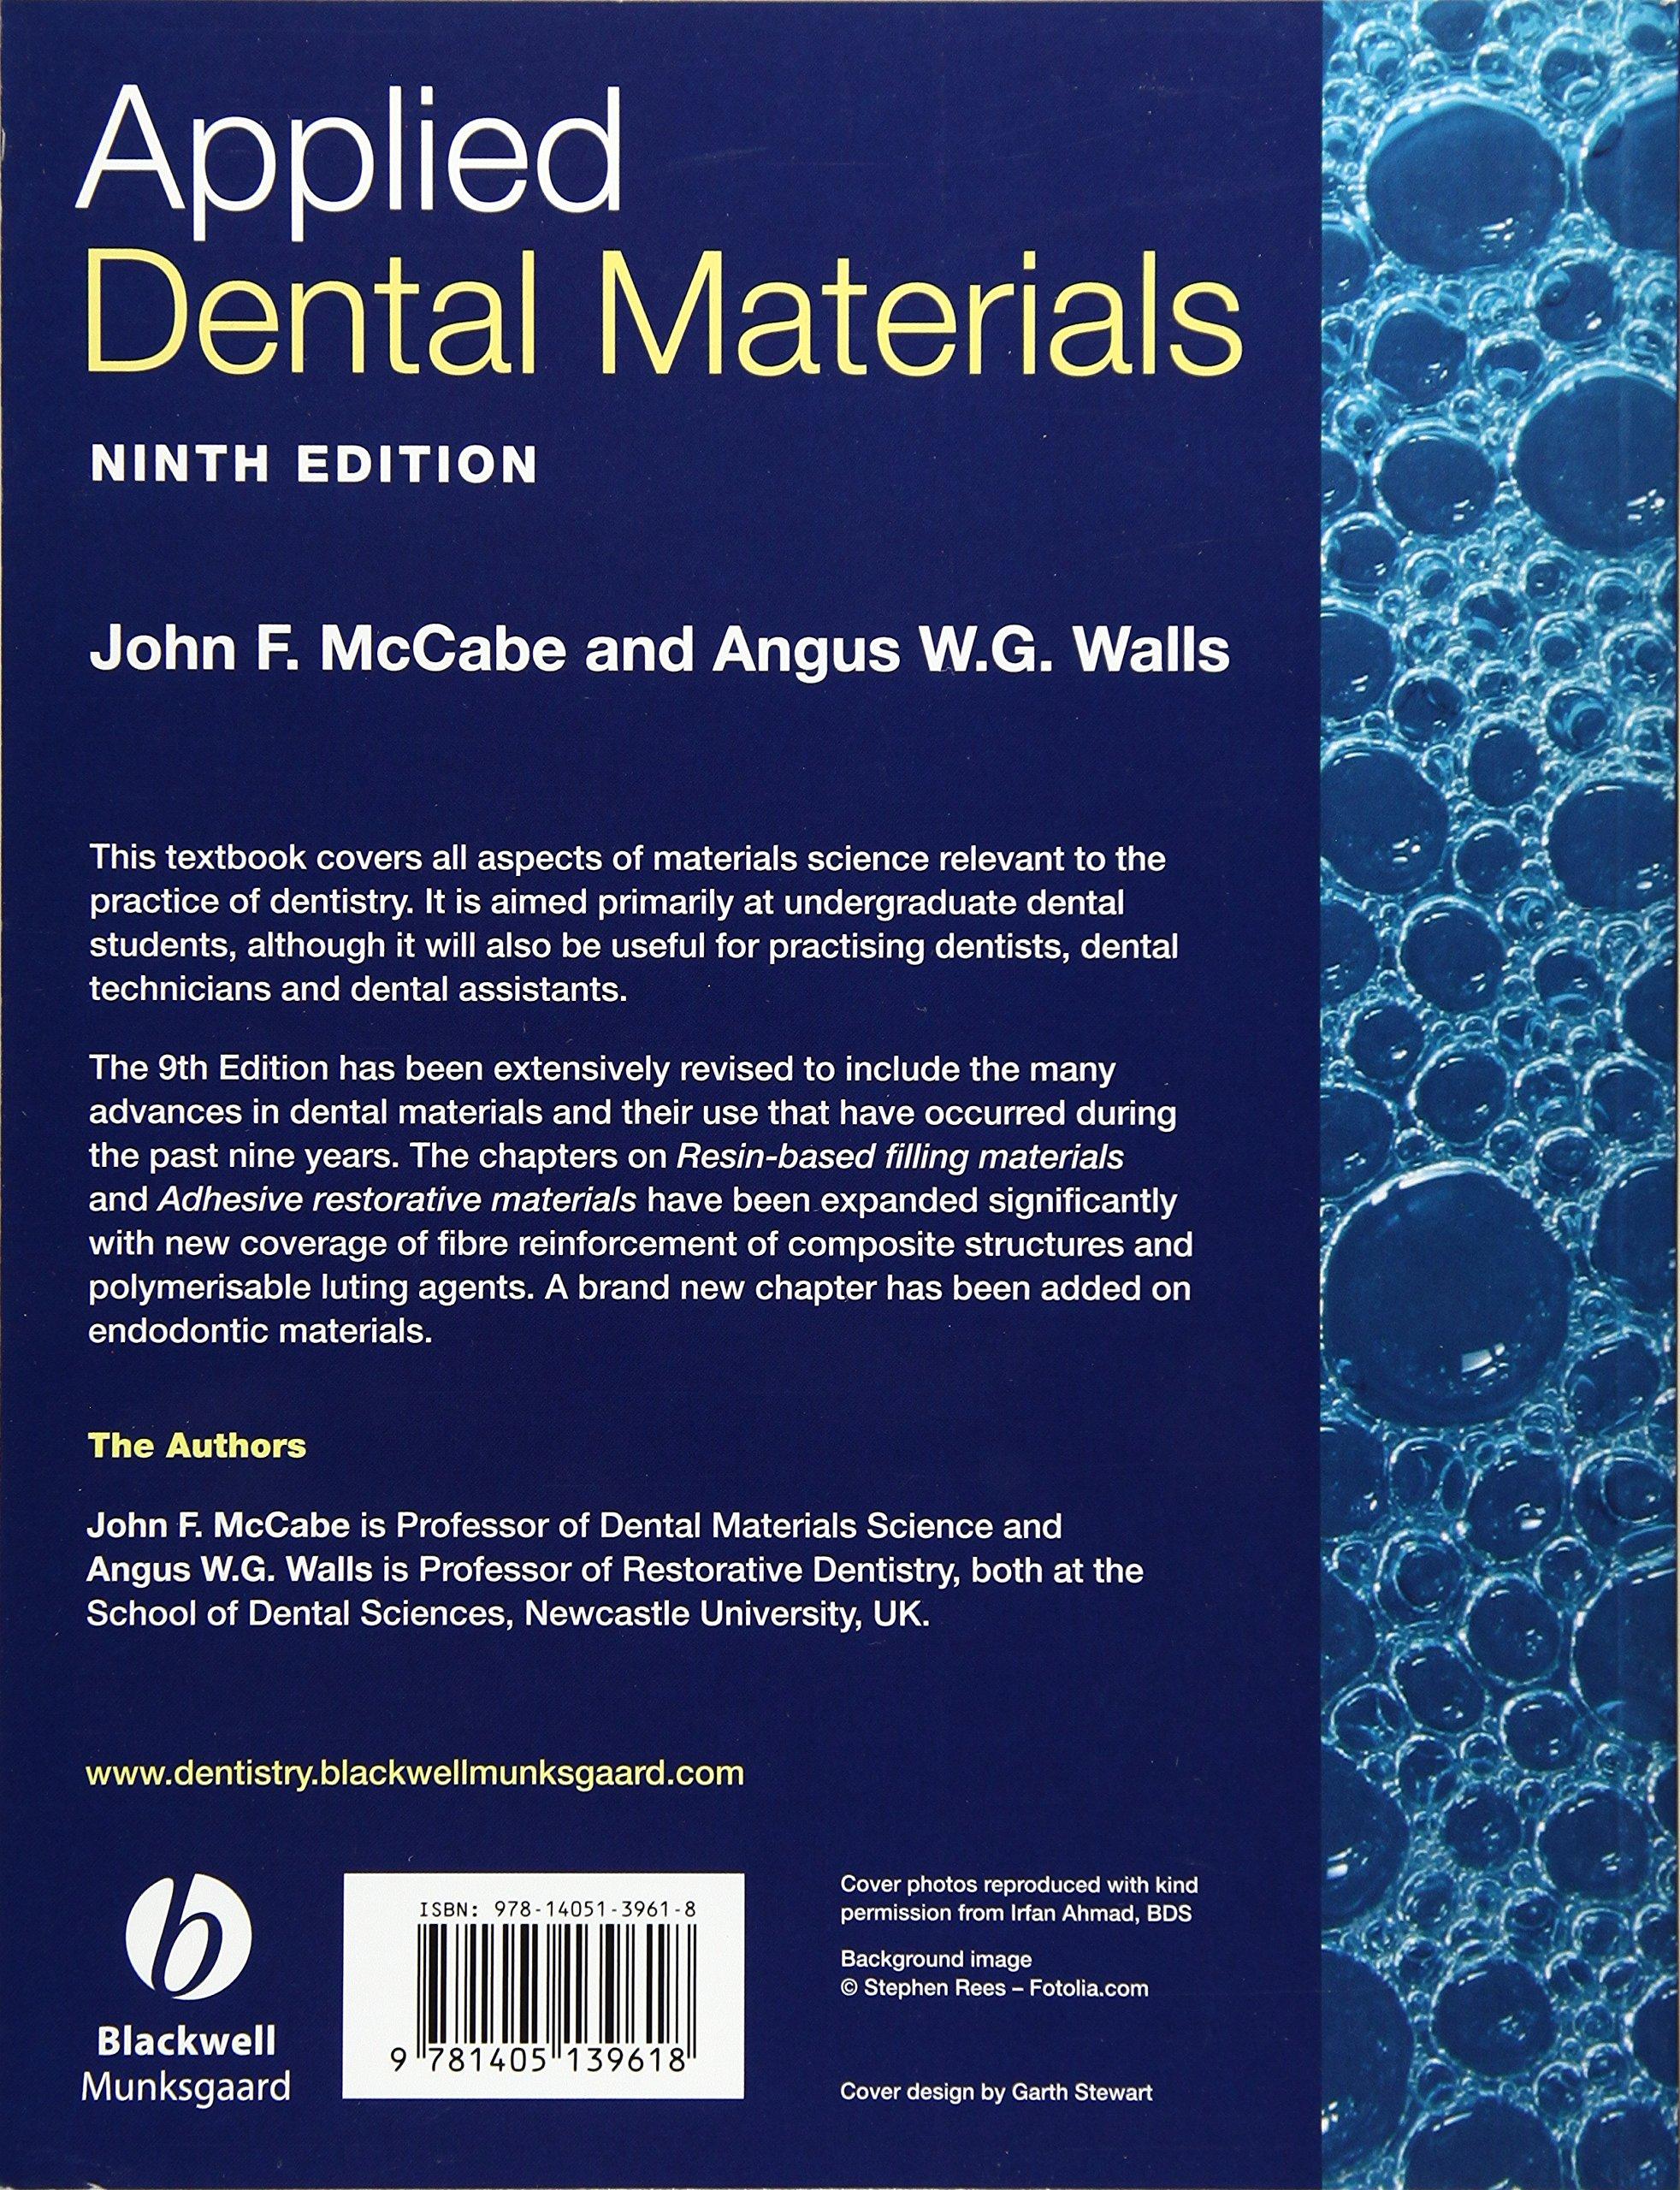 Applied Dental Materials, 9th Edition: Amazon.de: John F. McCabe ...